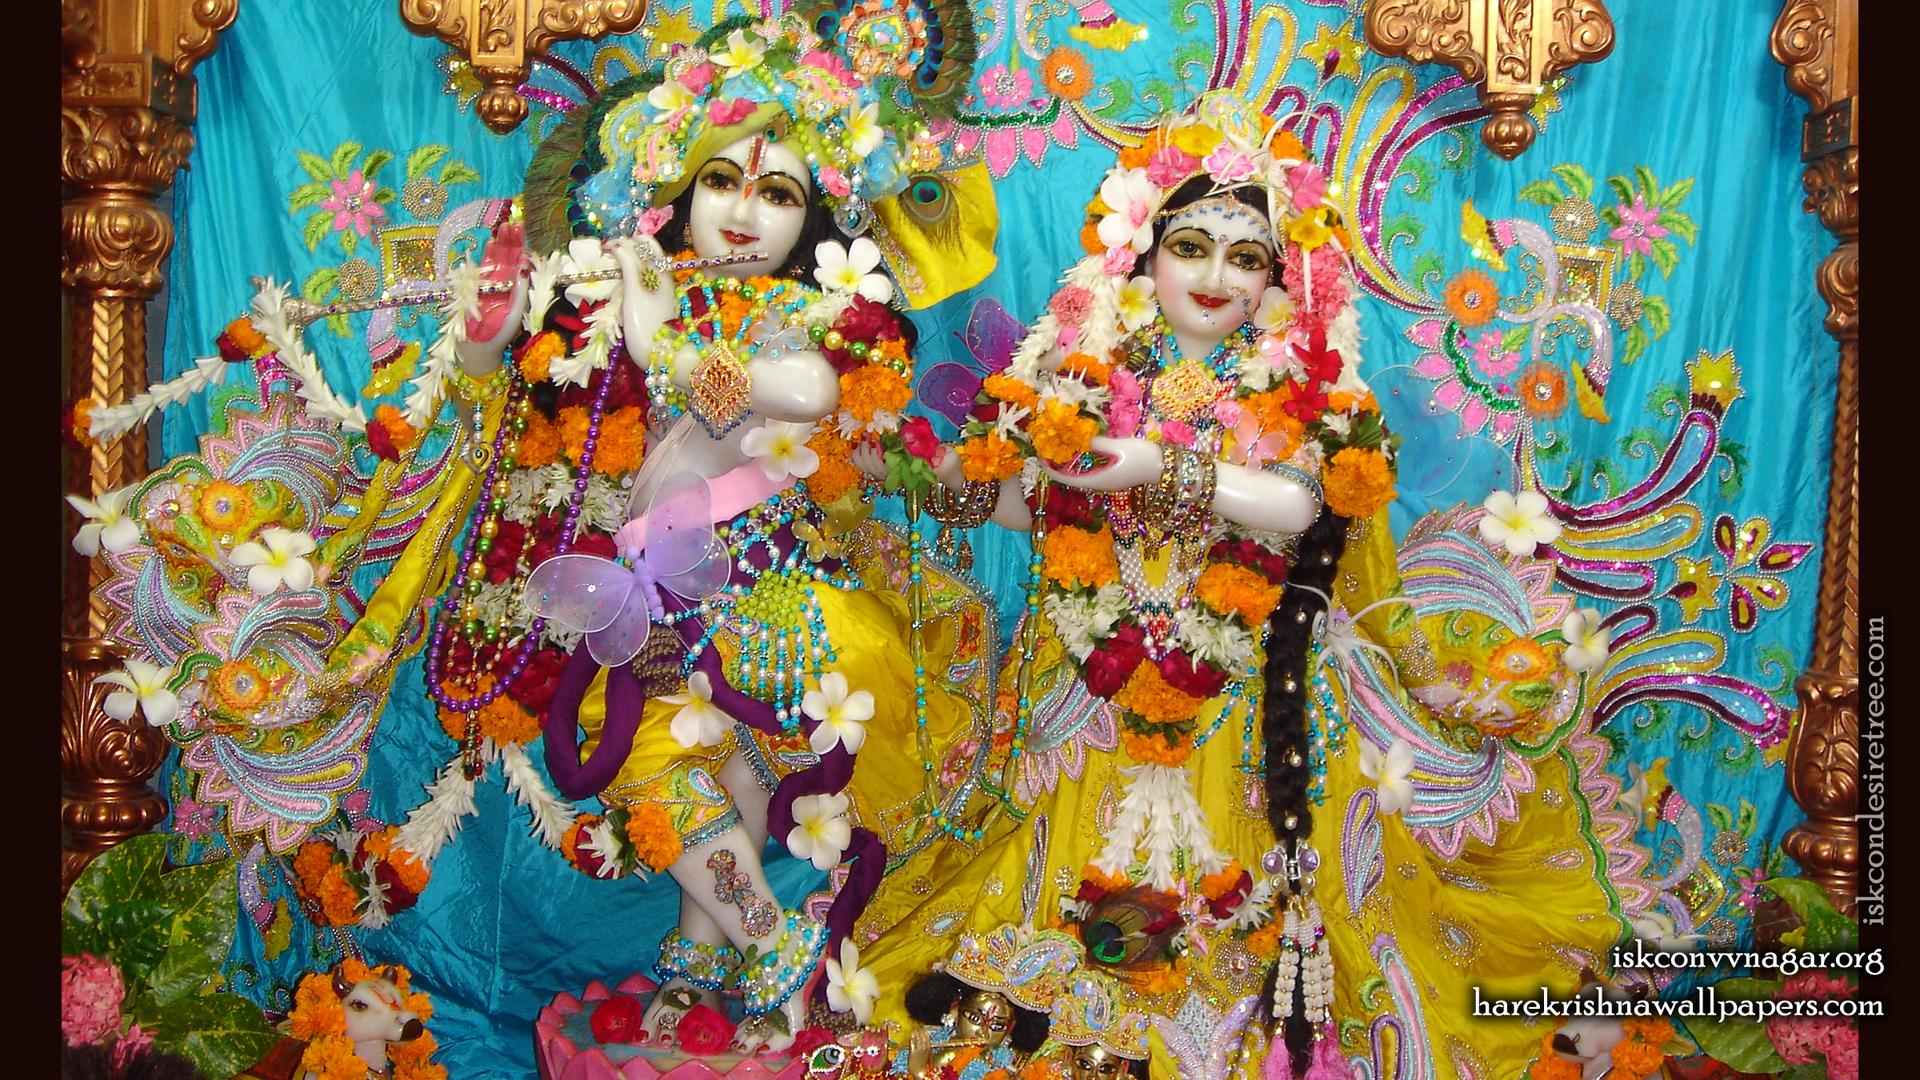 Sri Sri Radha Giridhari Wallpaper (008) Size 1920x1080 Download